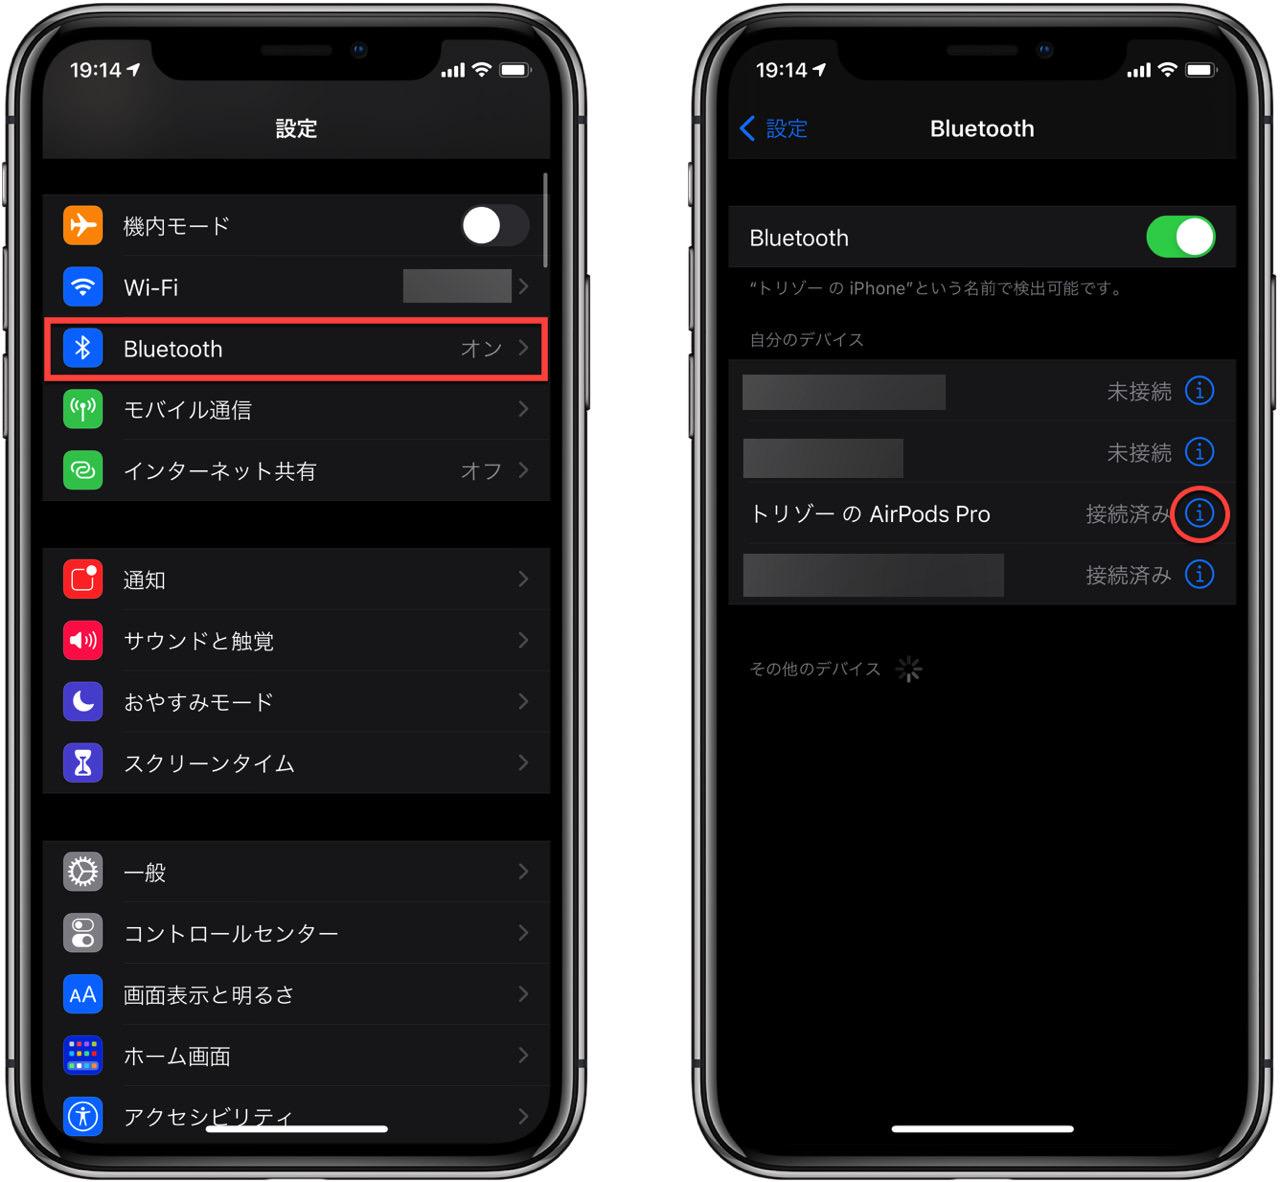 BluetoothでAirPods Proの情報を参照